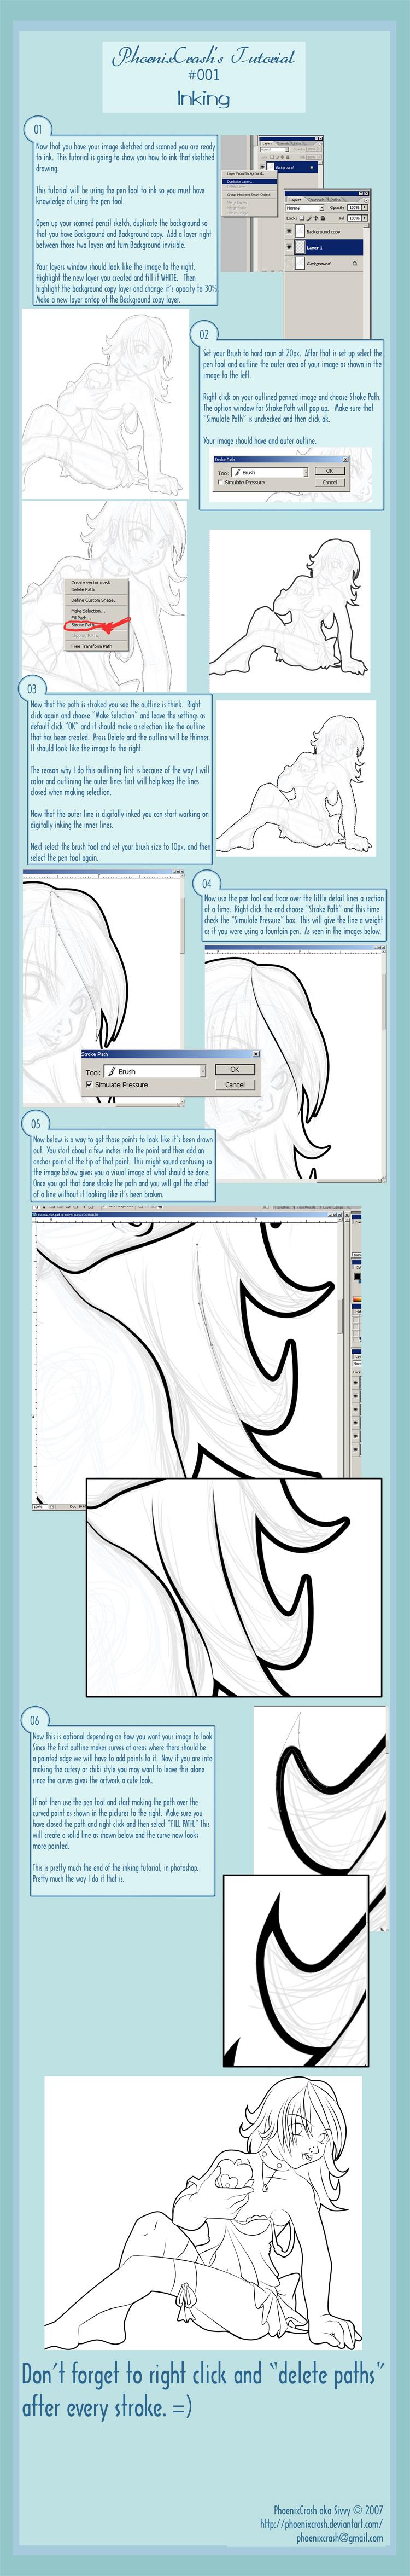 My Tutorial 002 - Digital Ink by phoenixcrash